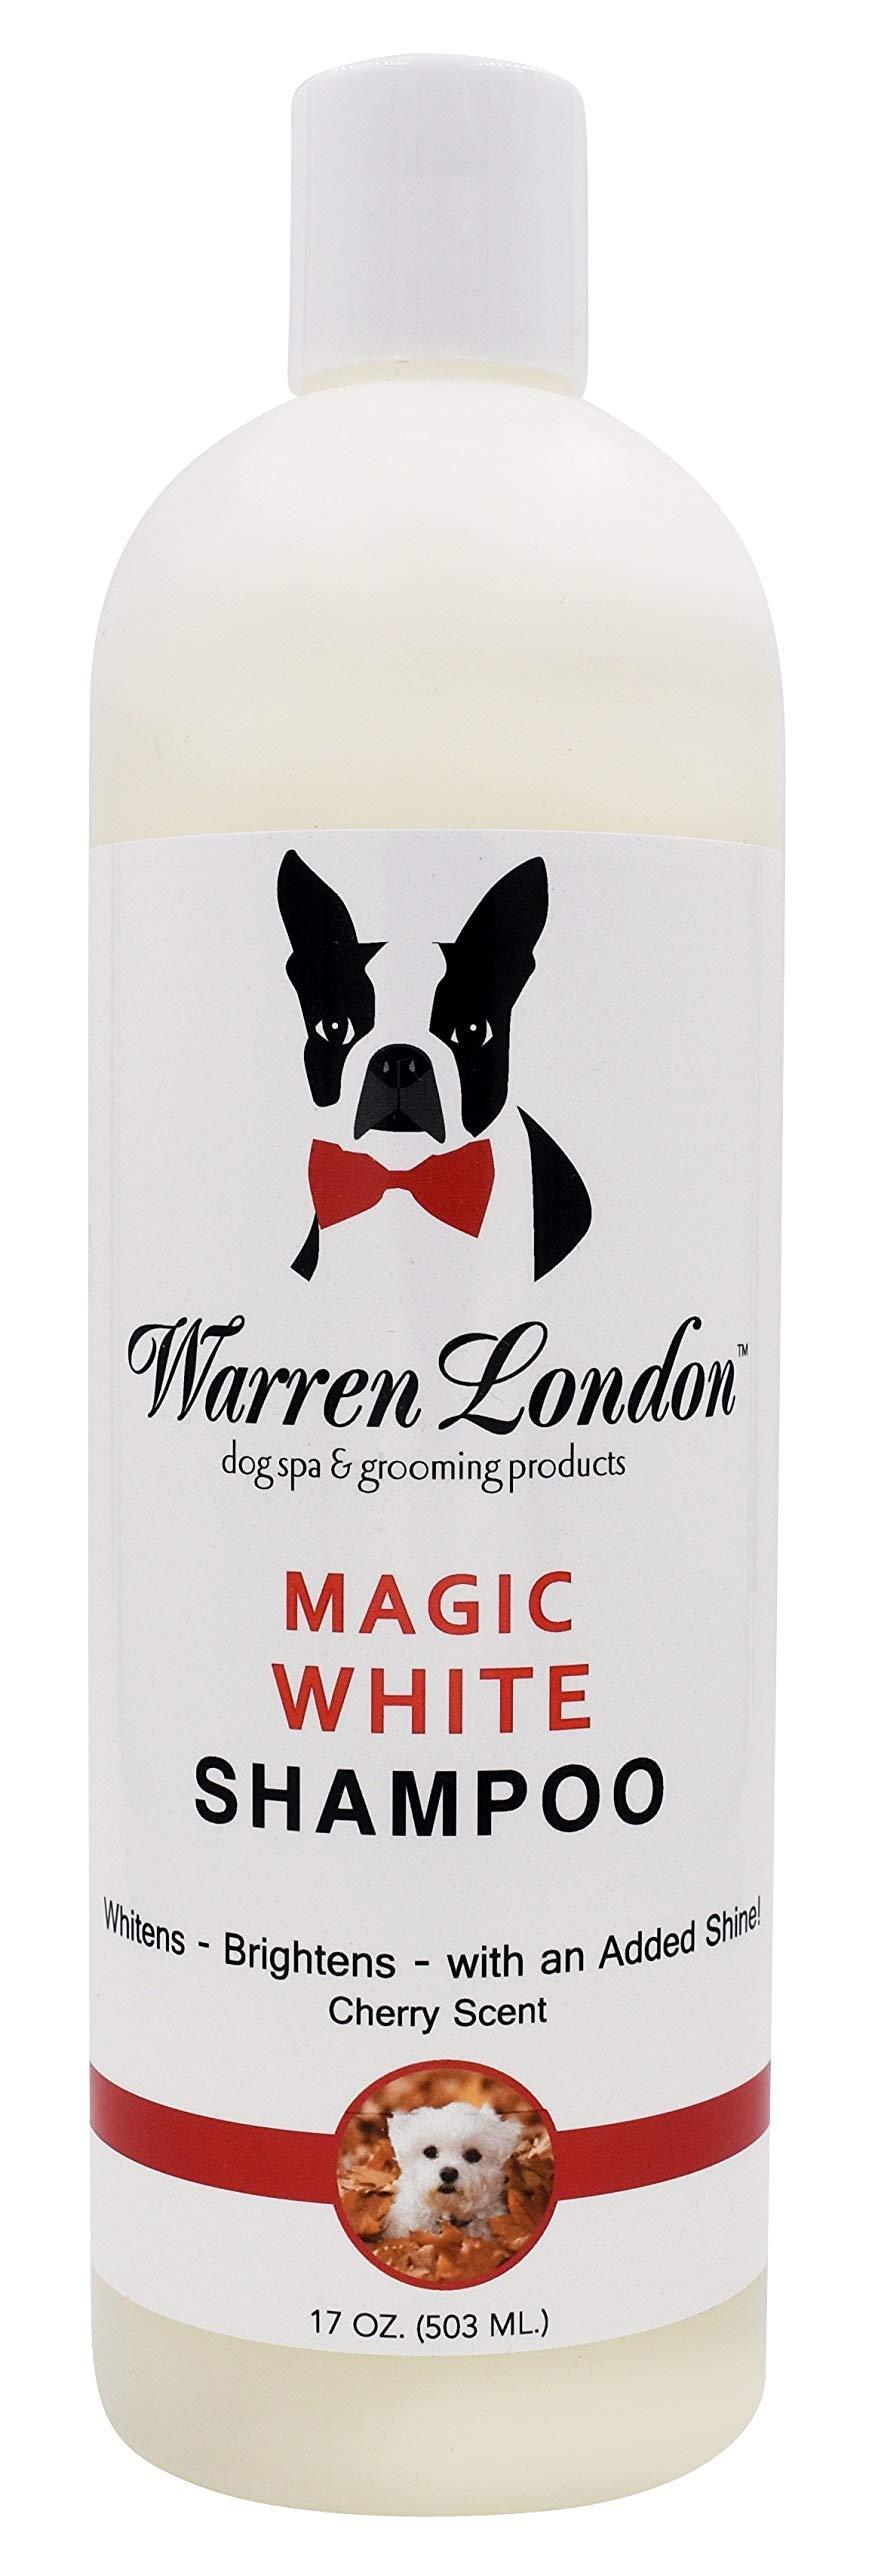 Warren London Magic White Brightening Dog Shampoo - Enhances Natural Color & Shine of All Coats - 17 oz & 1 Gallon